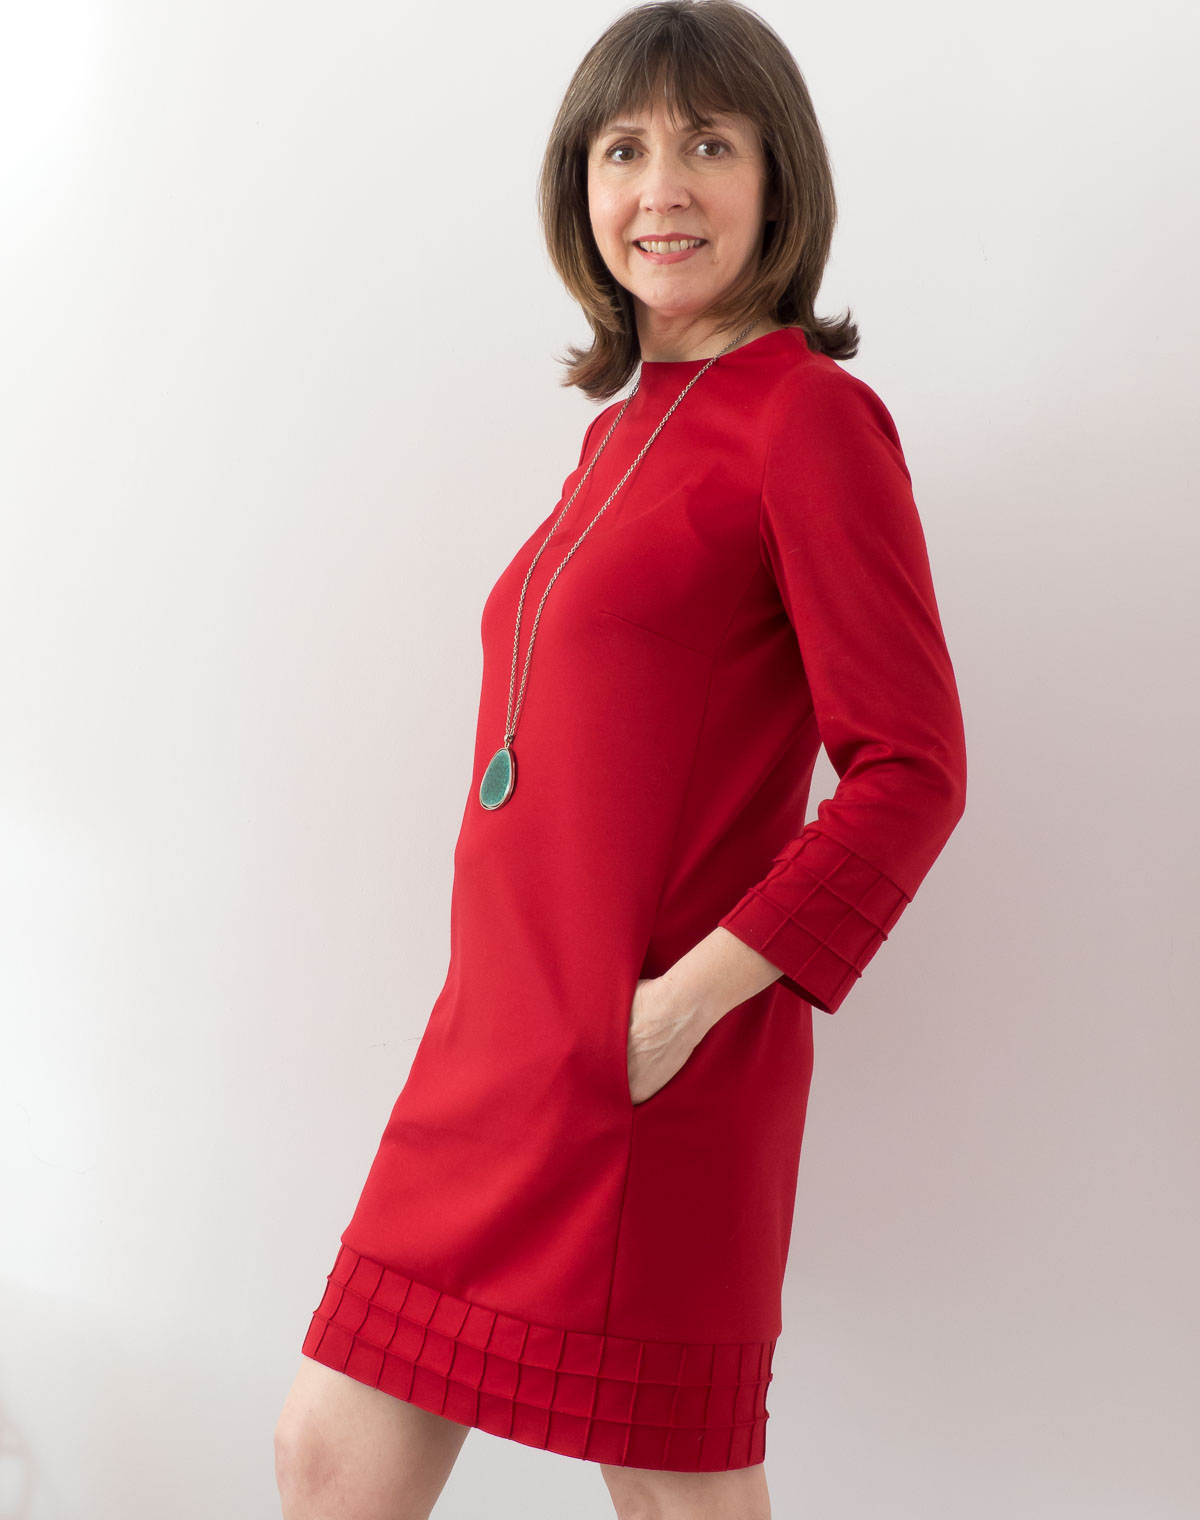 BurdaStyle Sweater Shift Dress